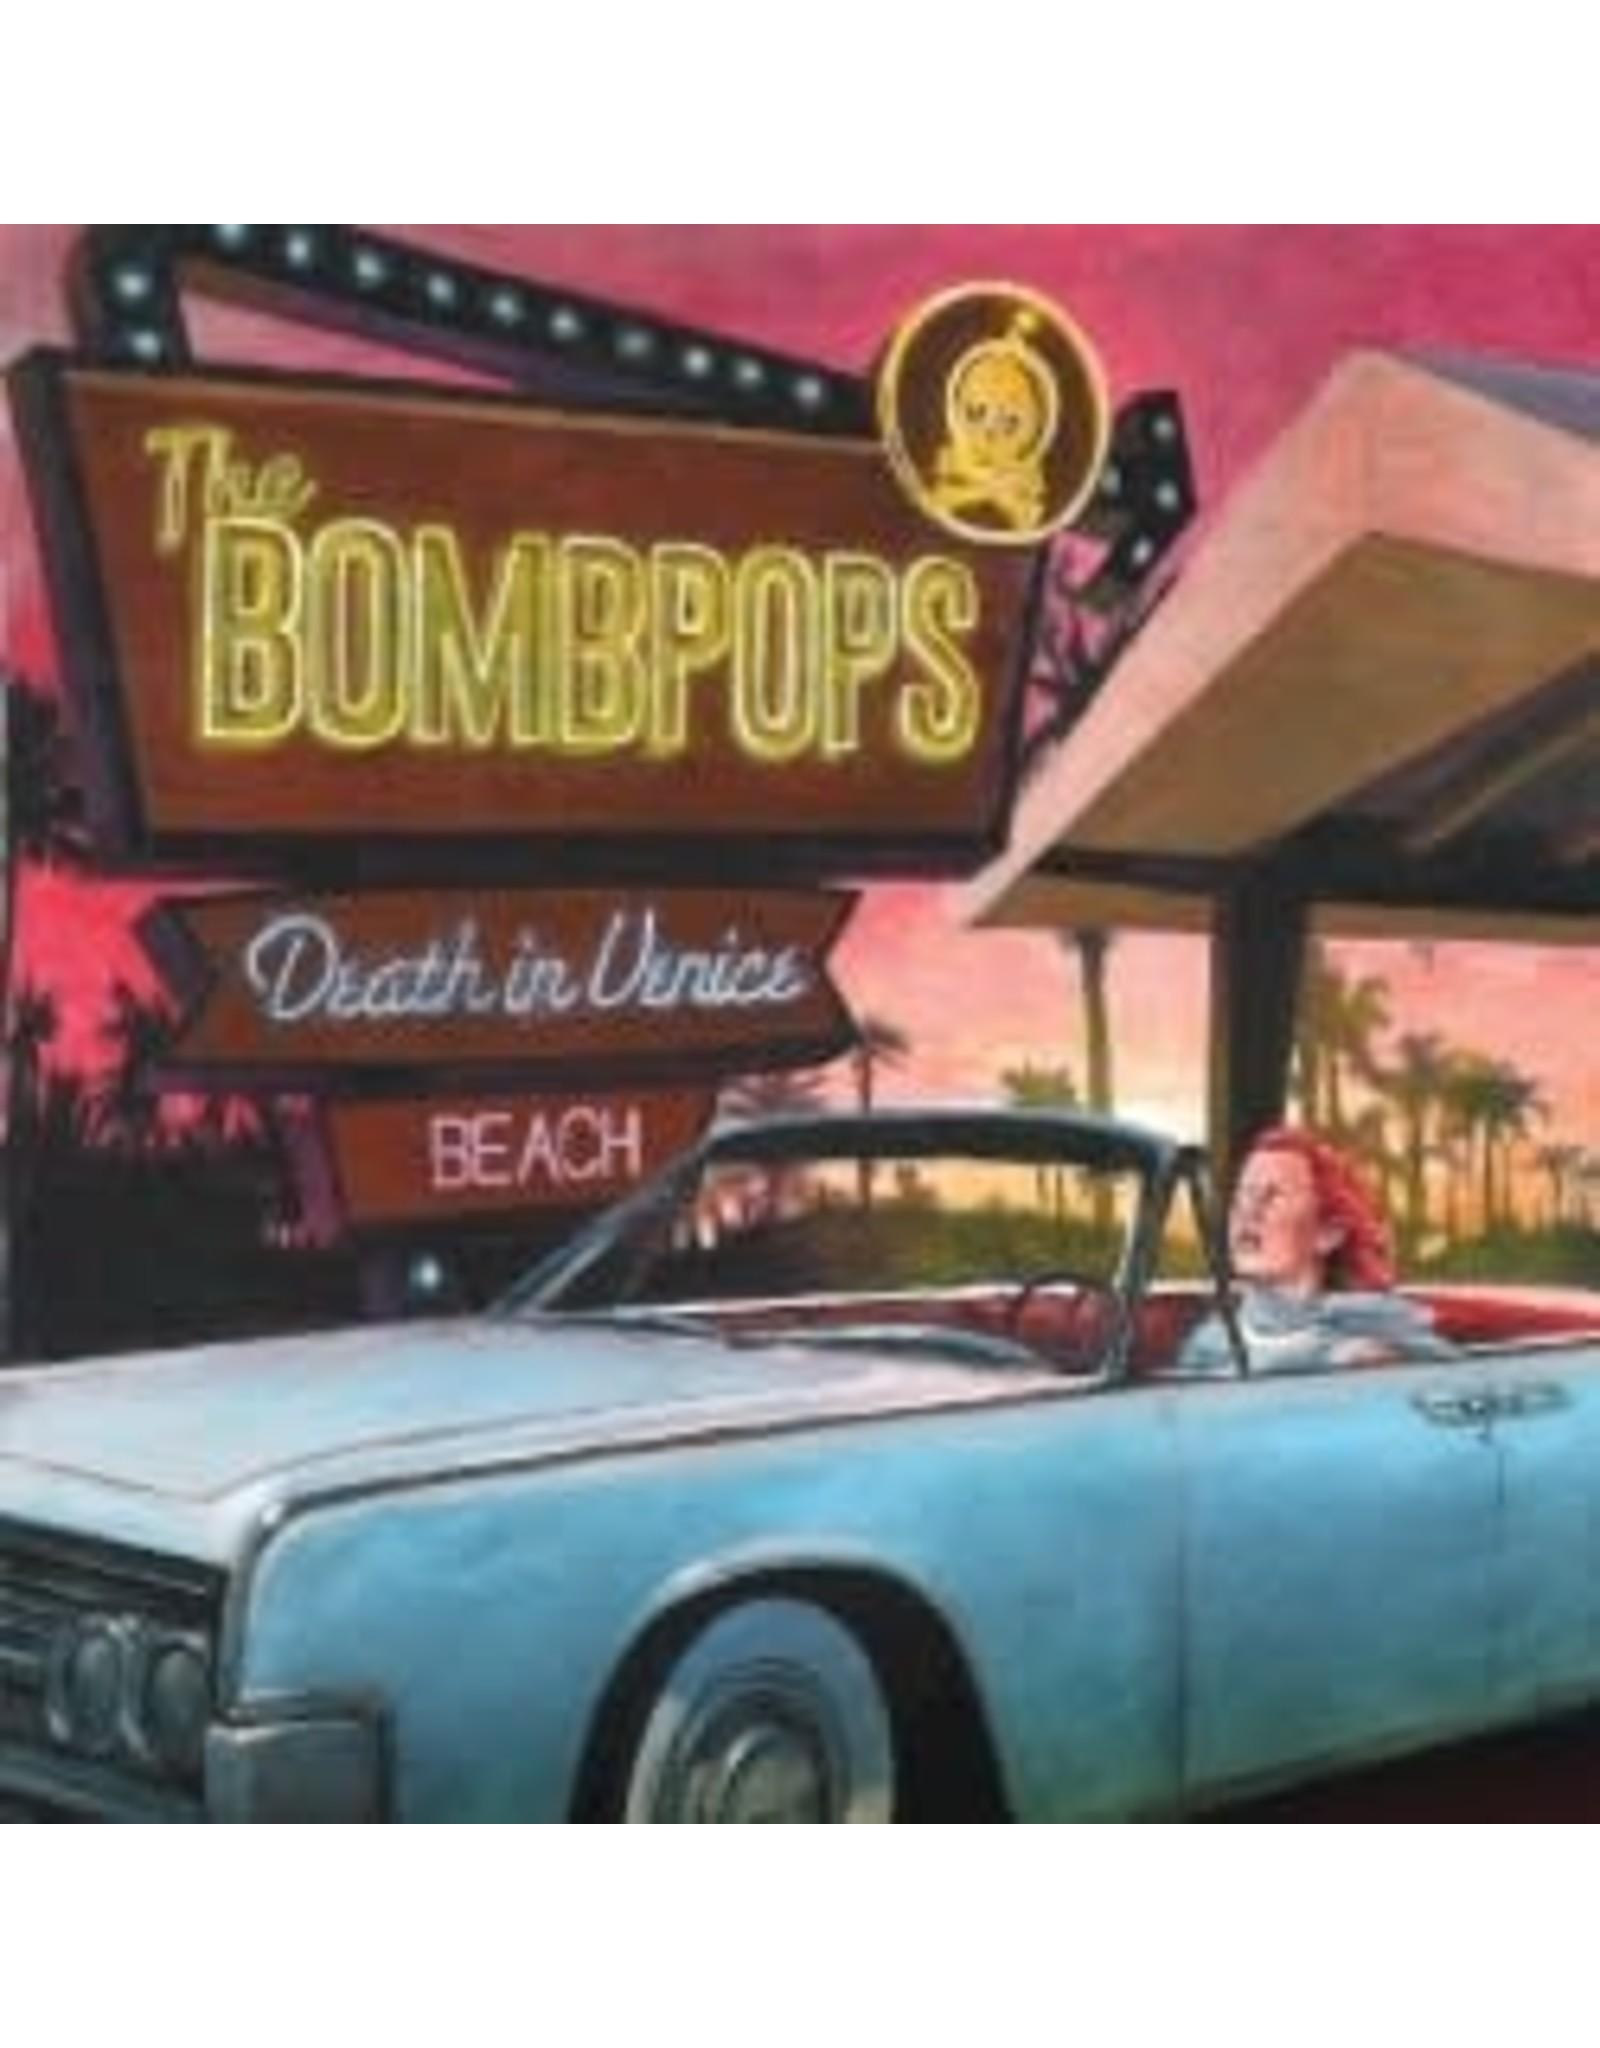 Bombpops - Death in Venice Beach LP